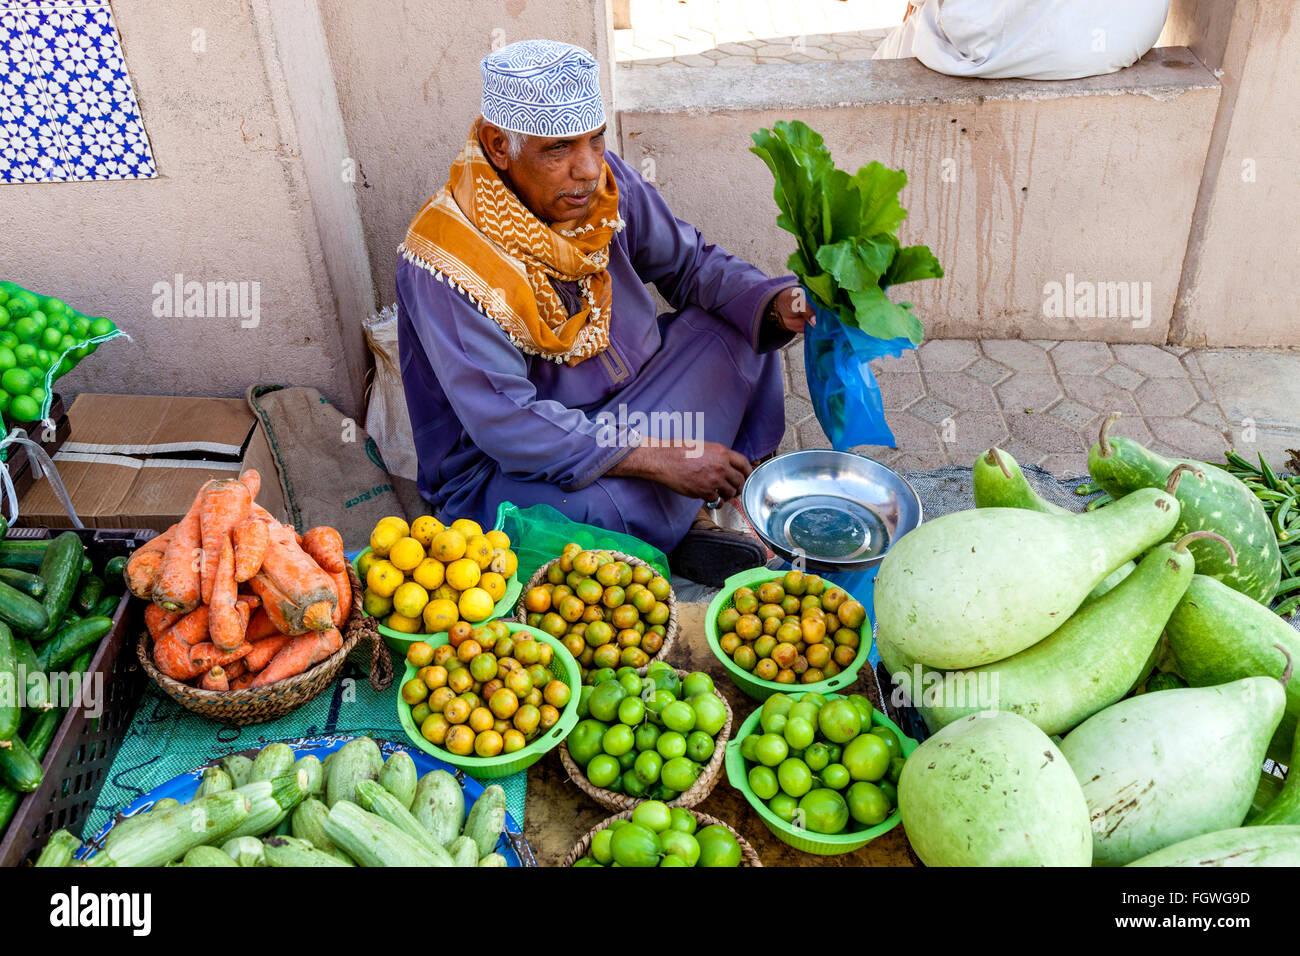 Marché de Fruits et légumes au Souk de Nizwa Nizwa, Ad Dakhiliyah, région, Oman Photo Stock